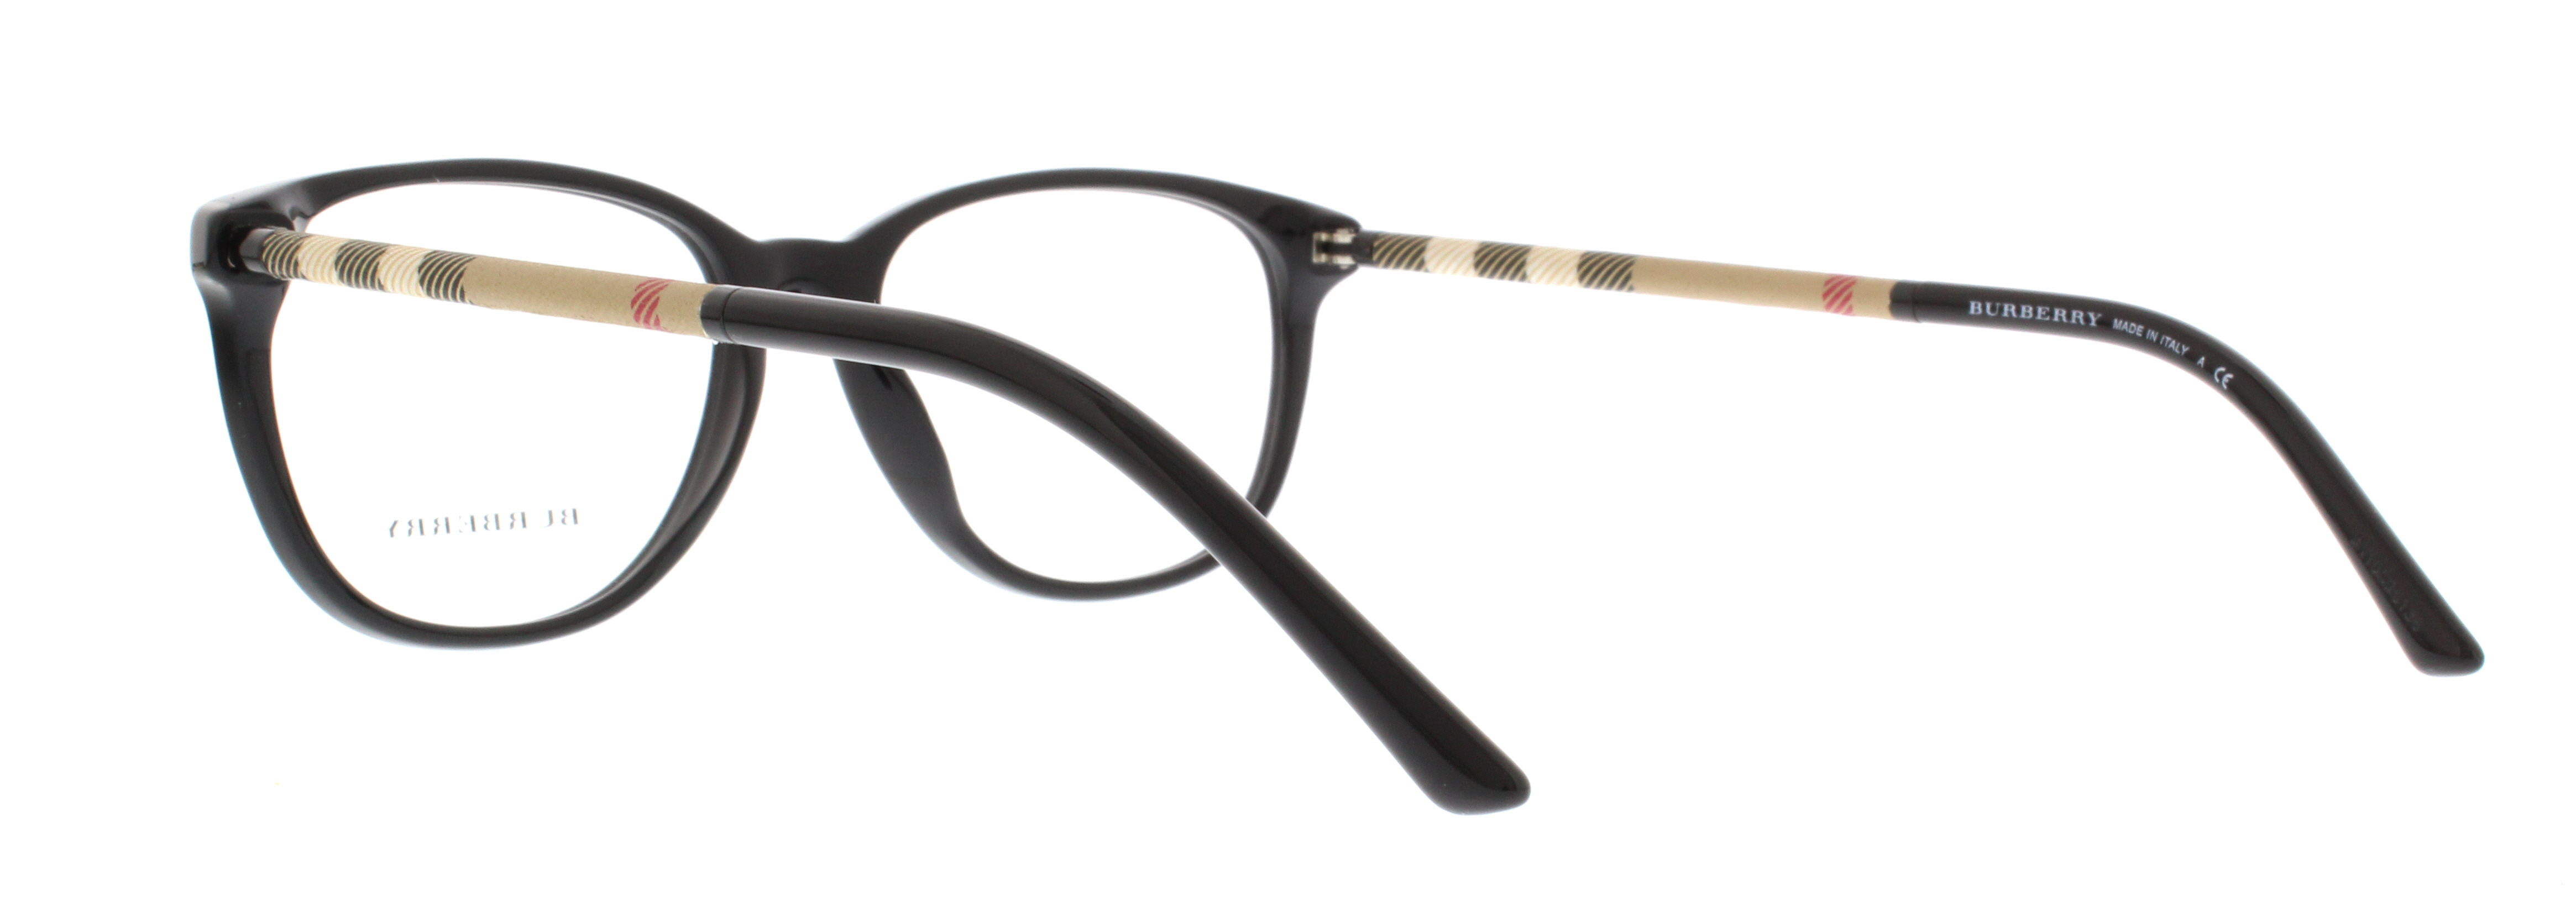 08353ff0770f BURBERRY Eyeglasses BE2112 3001 Black 52MM - Walmart.com